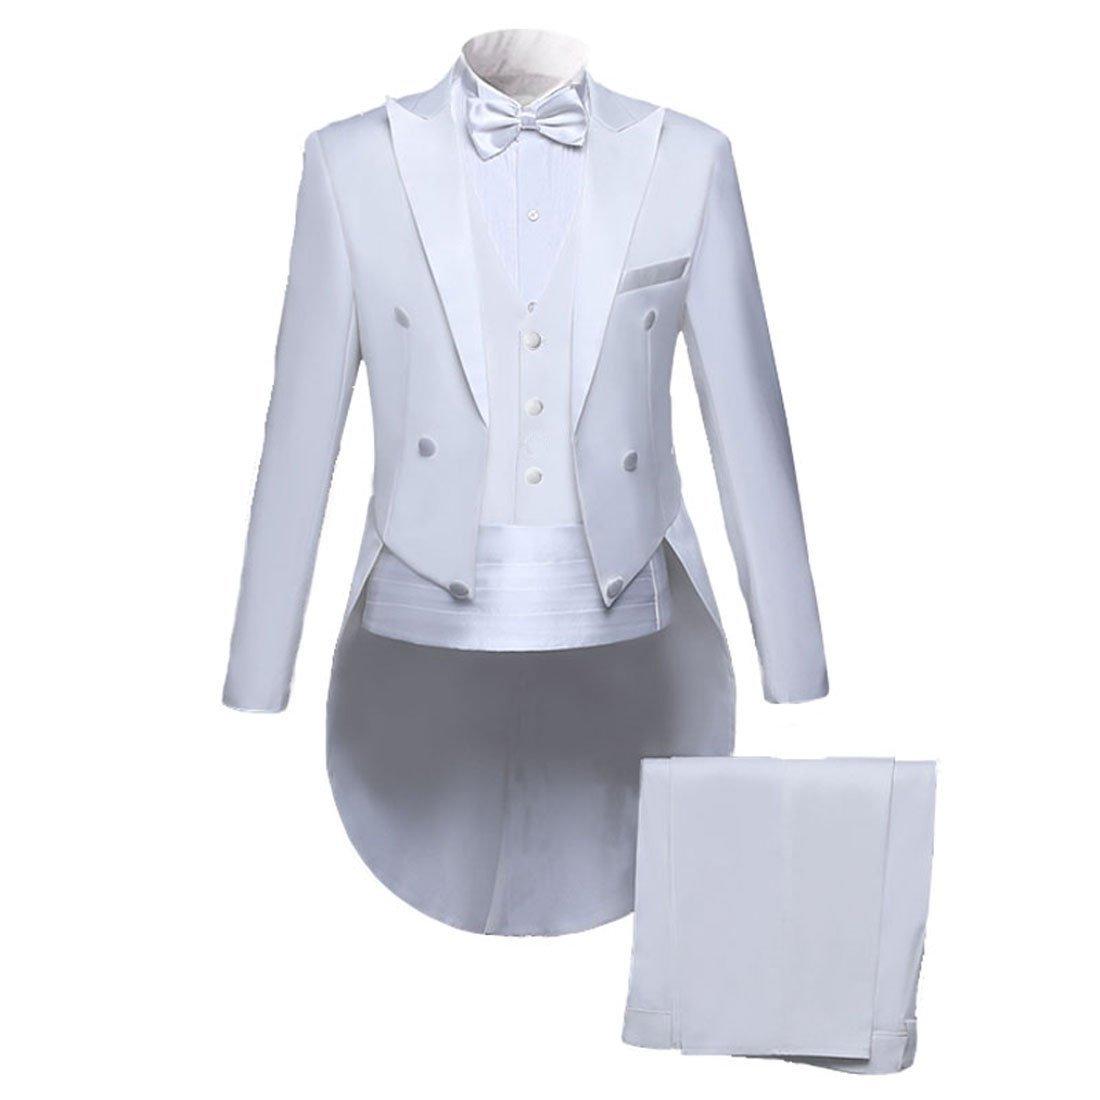 PYJTRL Men Classic 5 Piece Set Tailcoat Tuxedo (Jacket+Pants+Vest+Bow Tie+Cummerbund